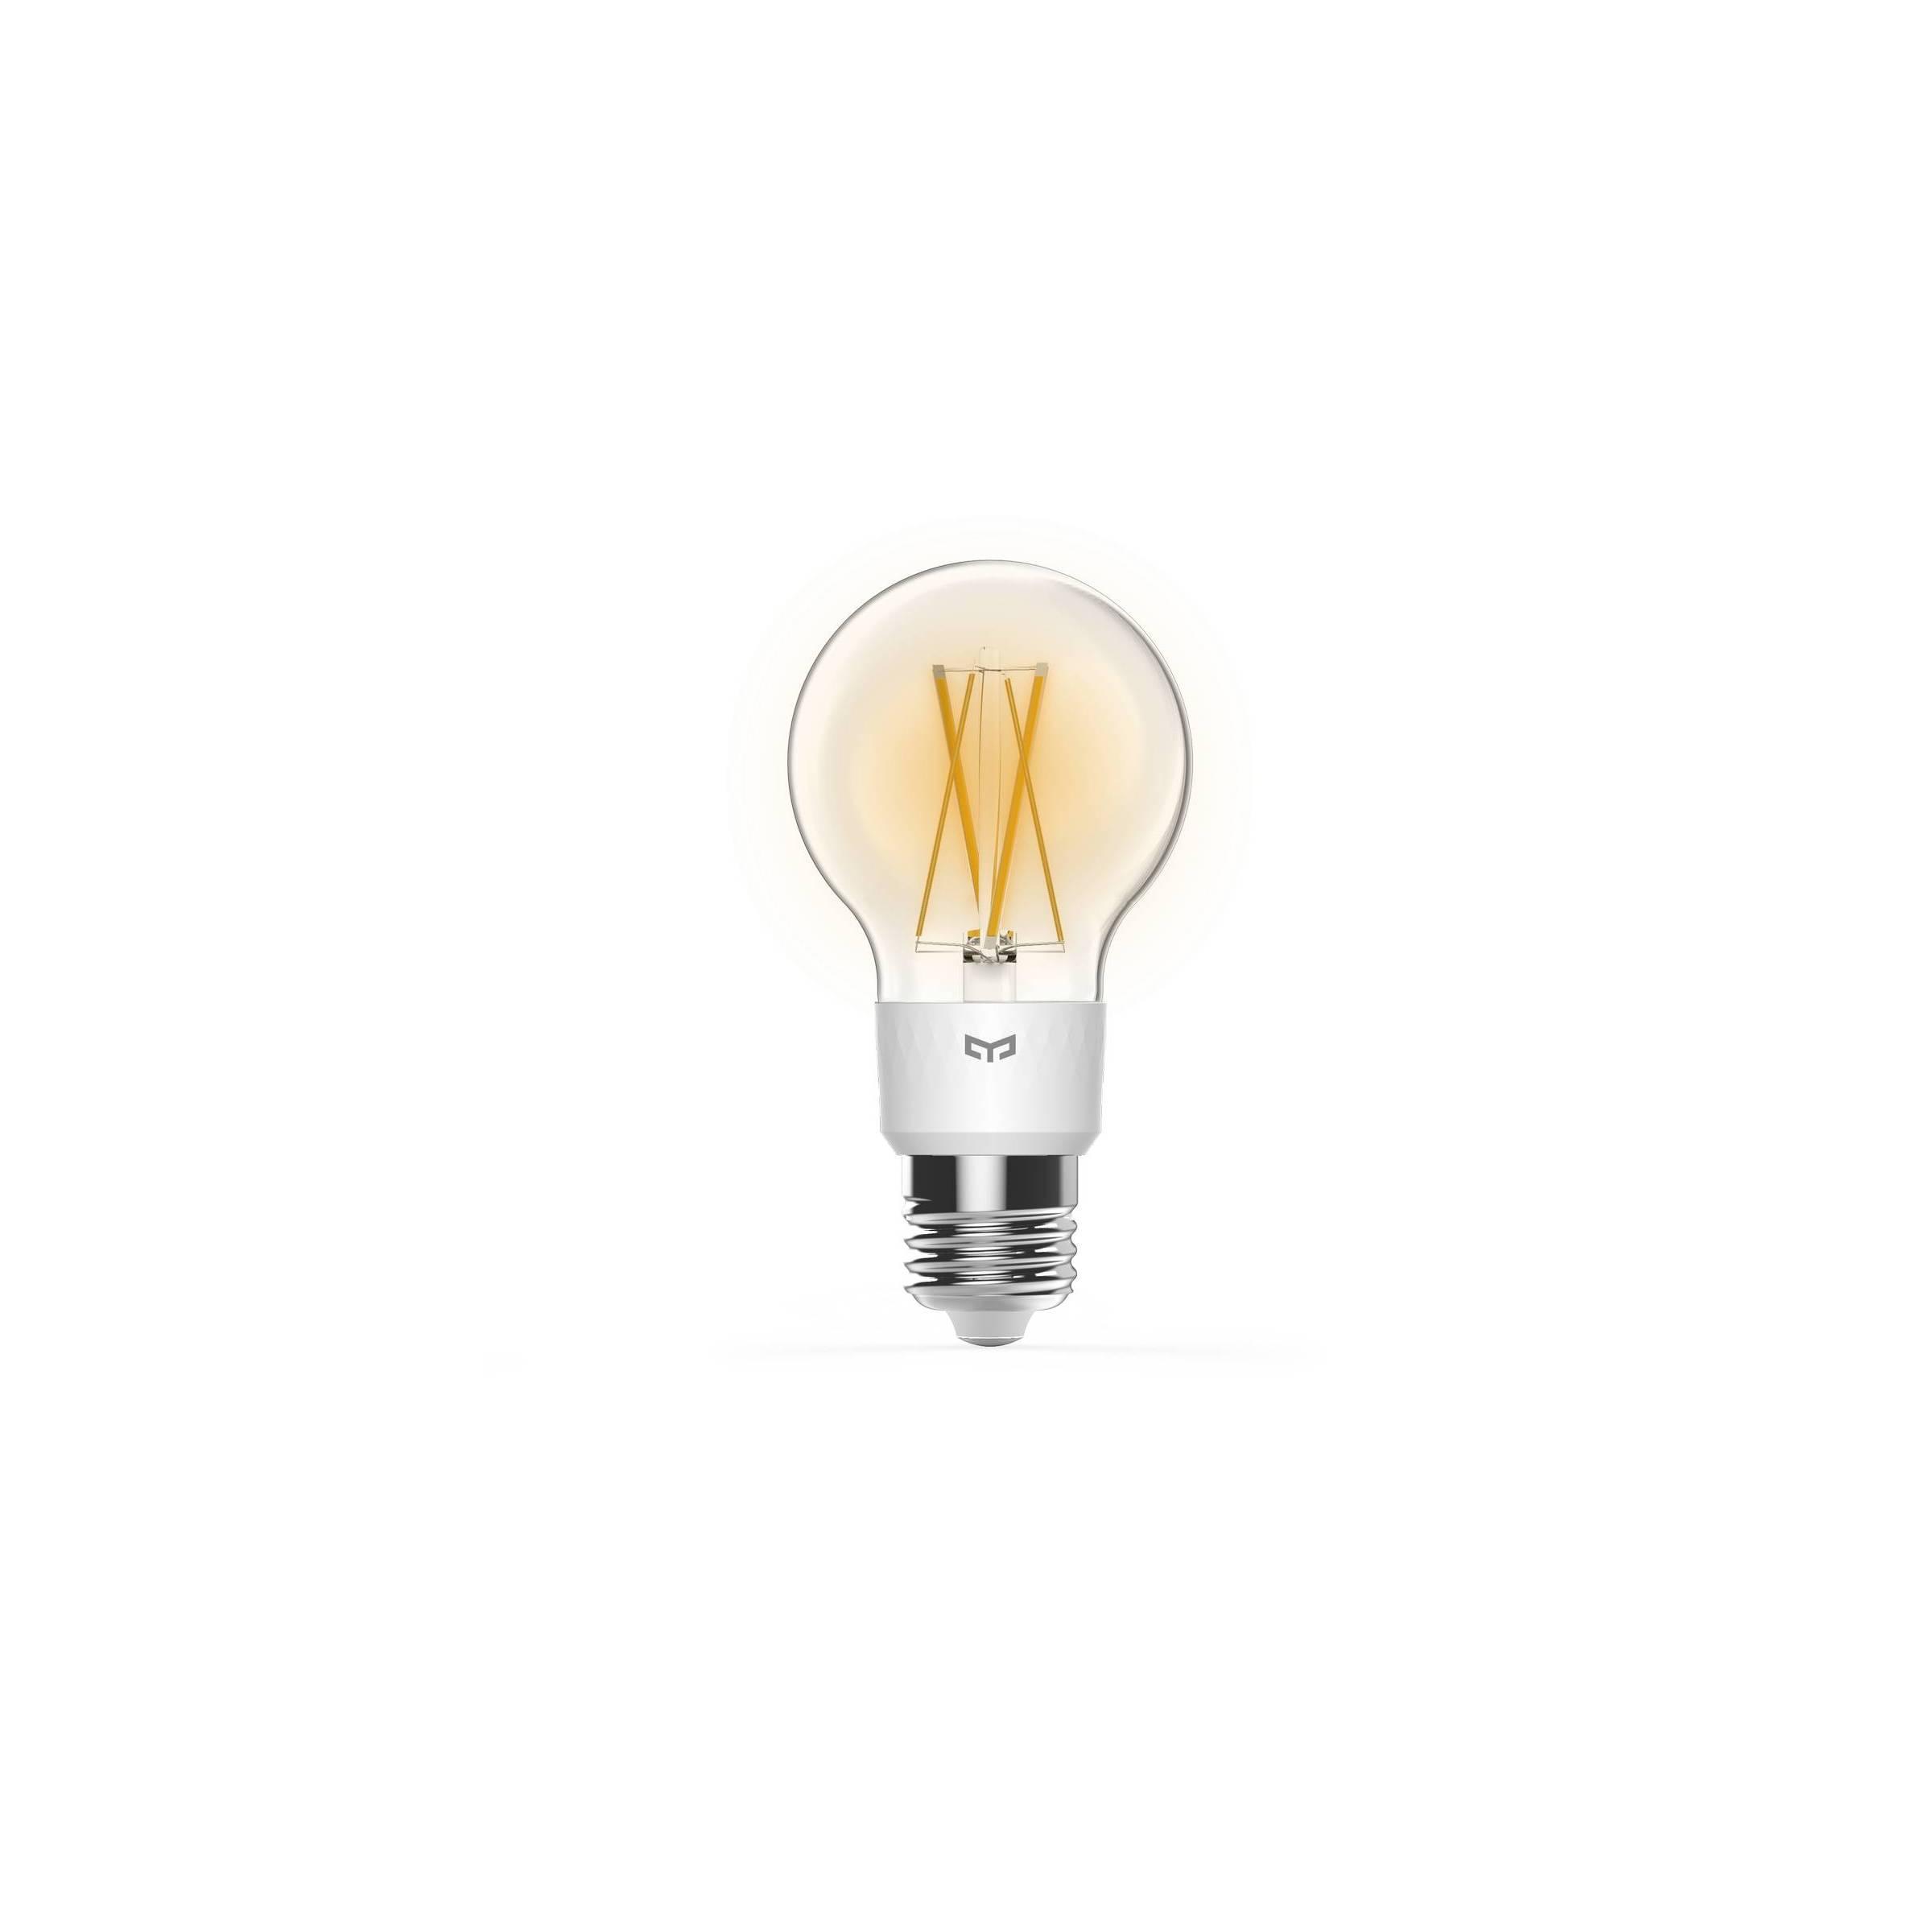 yeelight – Yeelight smart led filament gløde pære på mackabler.dk